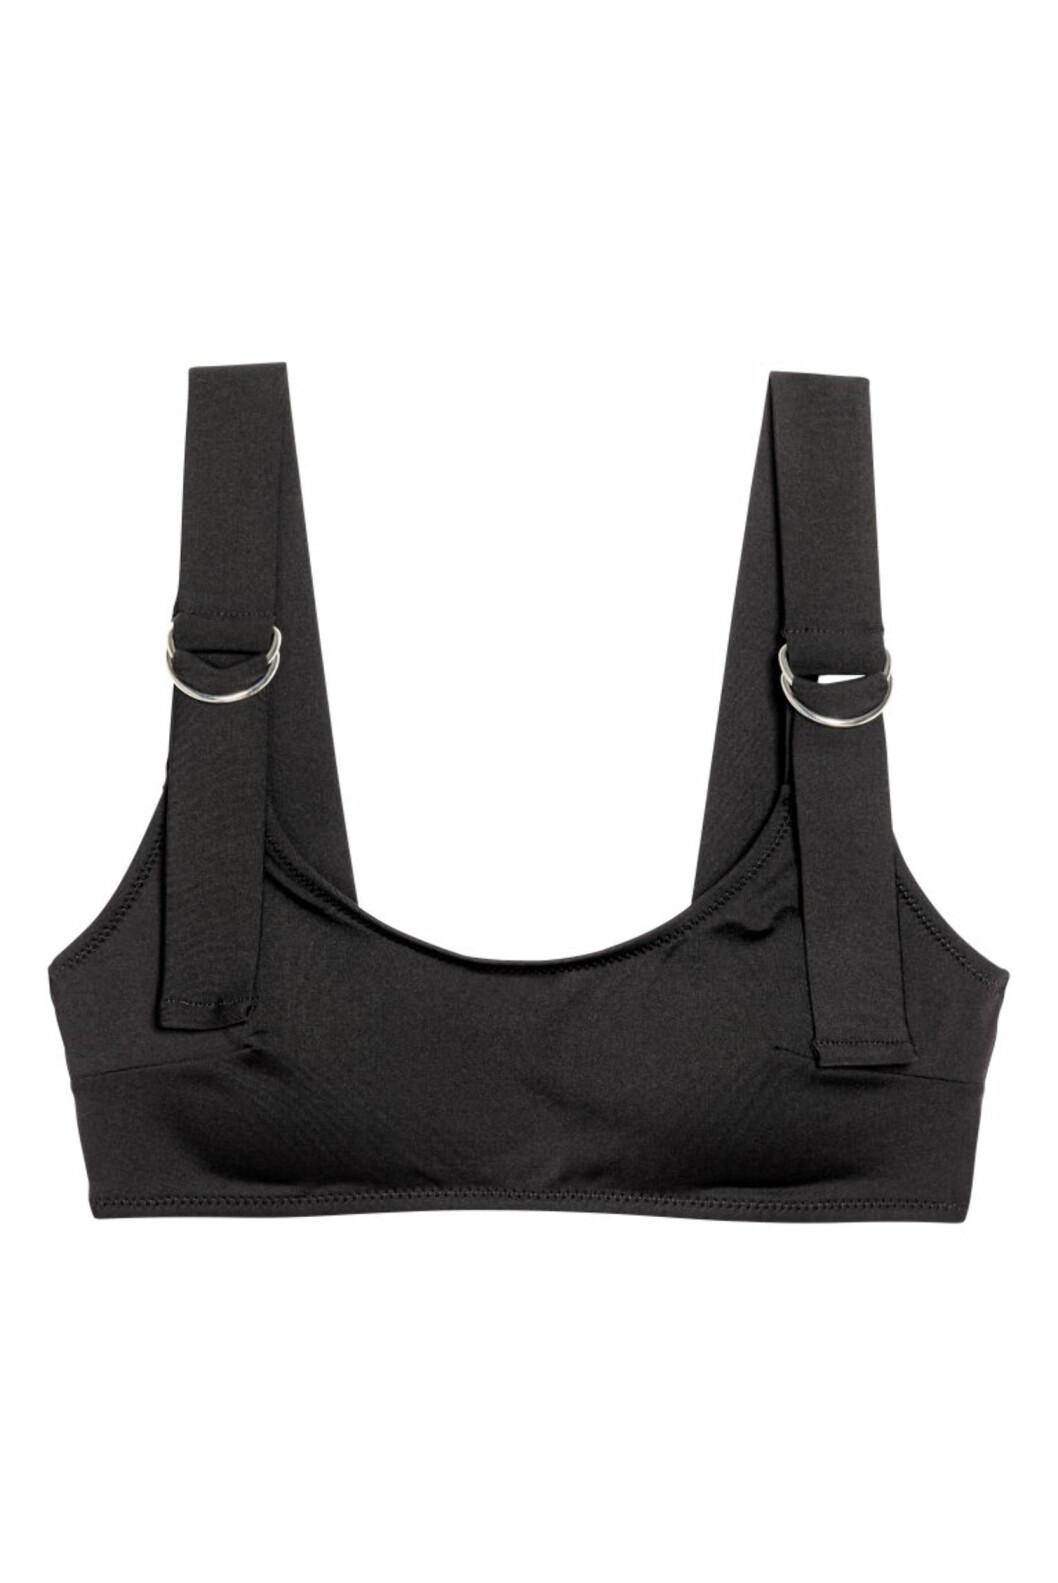 <strong>Svart bikinitopp fra H&M  199,-  http:</strong>//www2.hm.com/no_no/productpage.0568572001.html